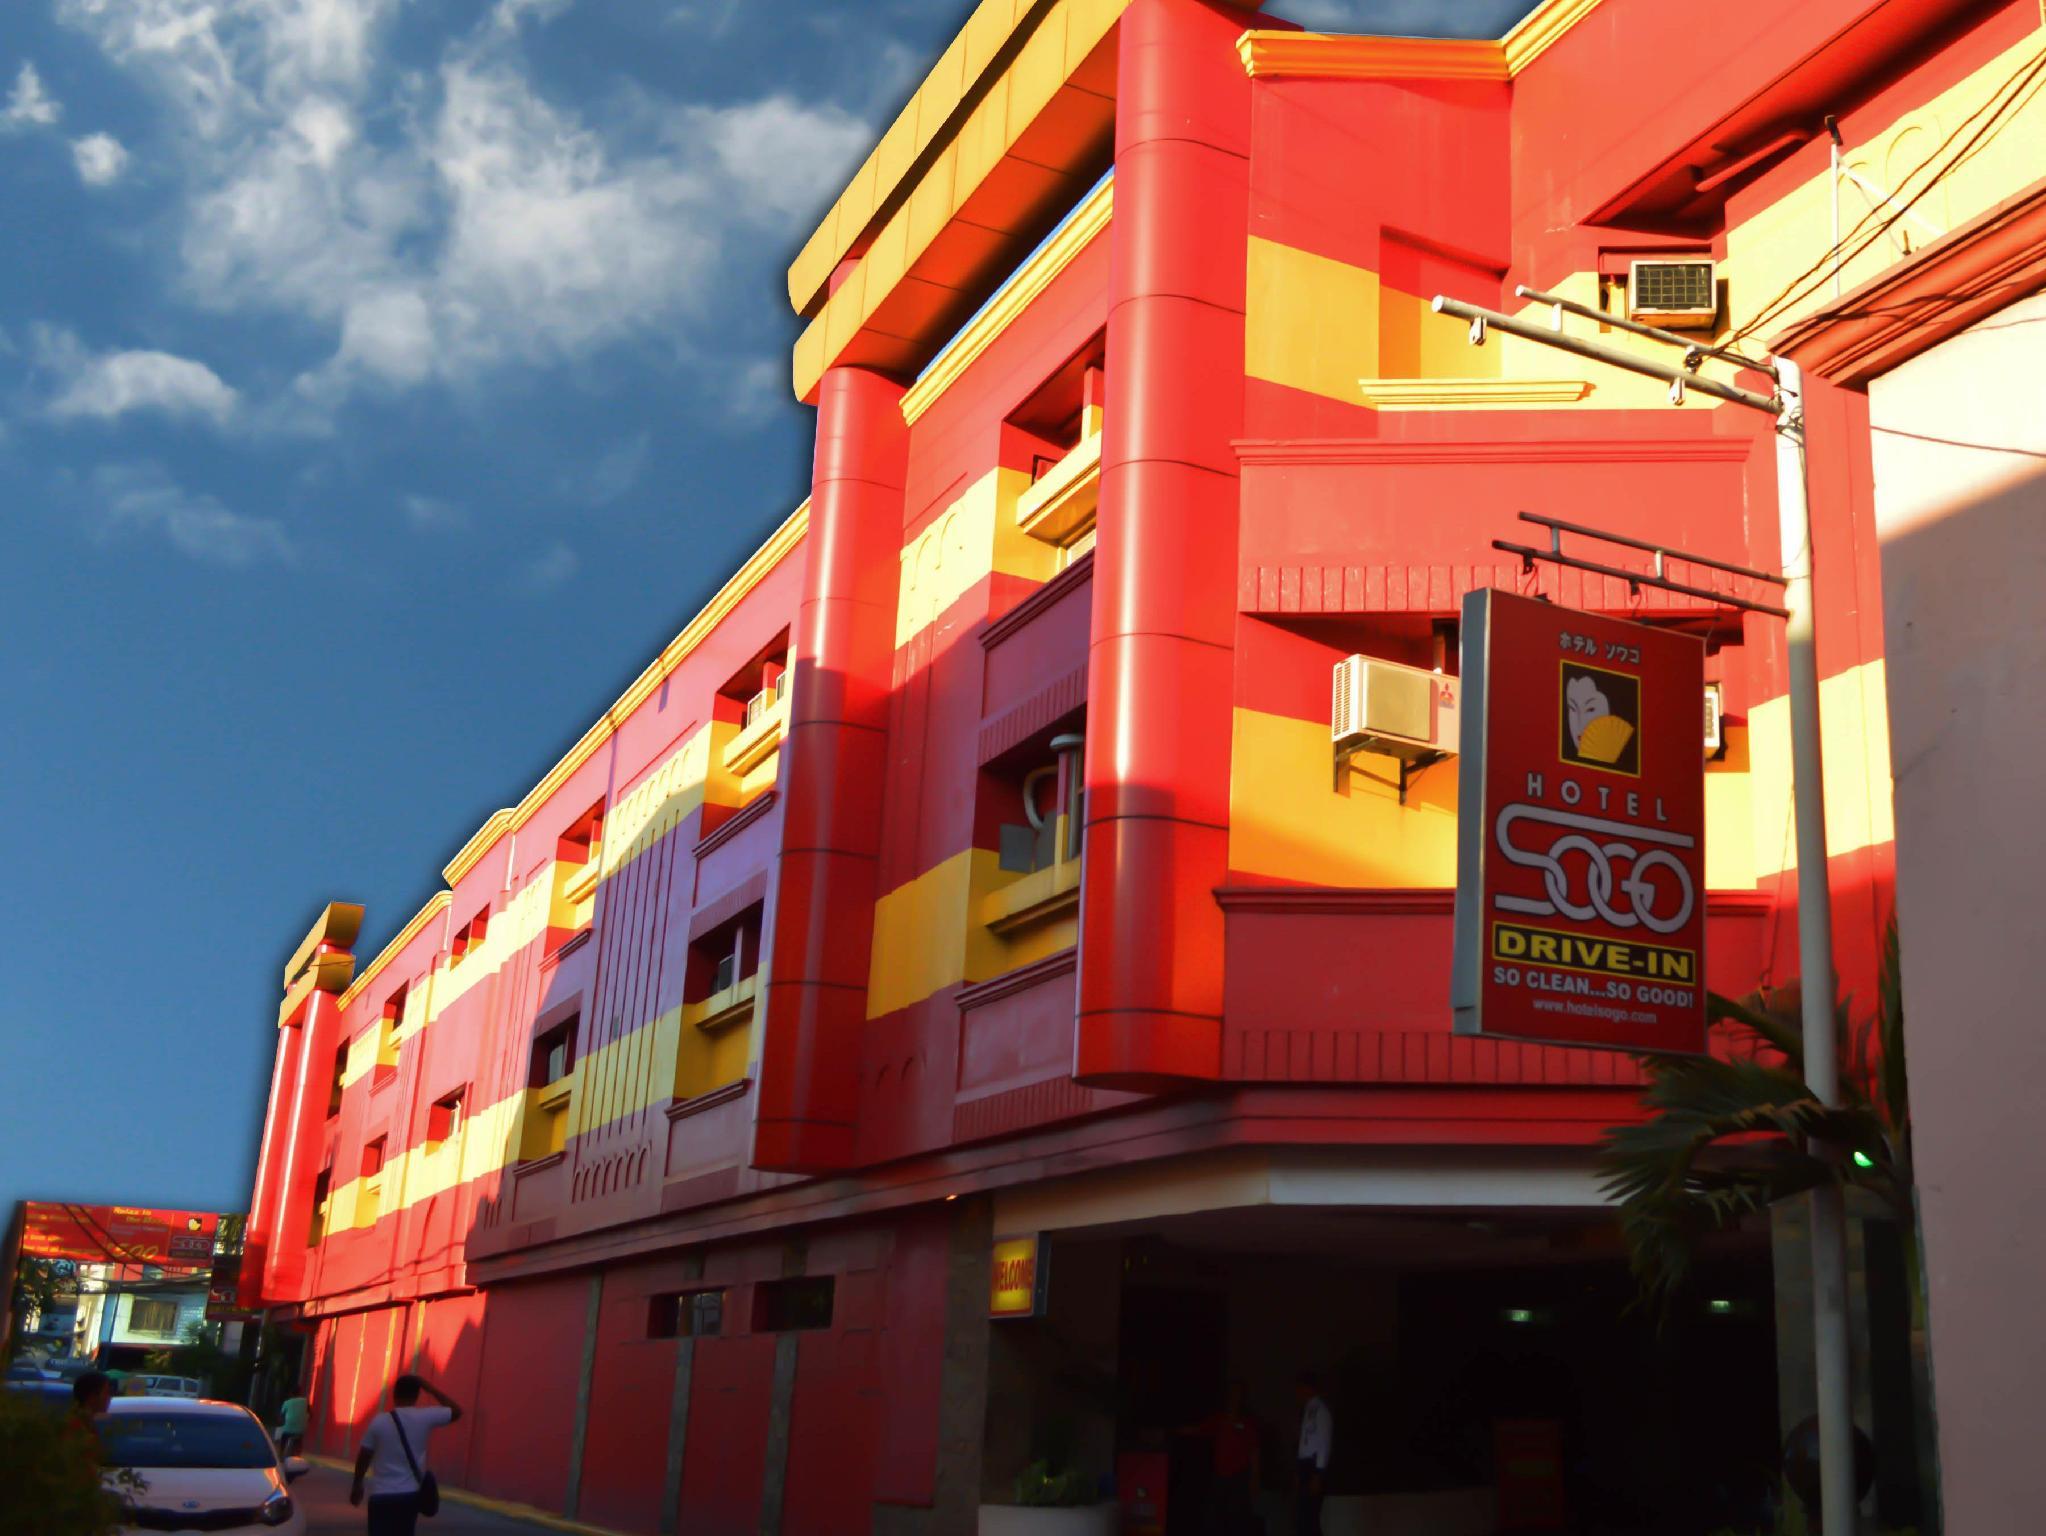 Hotel Sogo Wood Street Pasay Manila Philippines